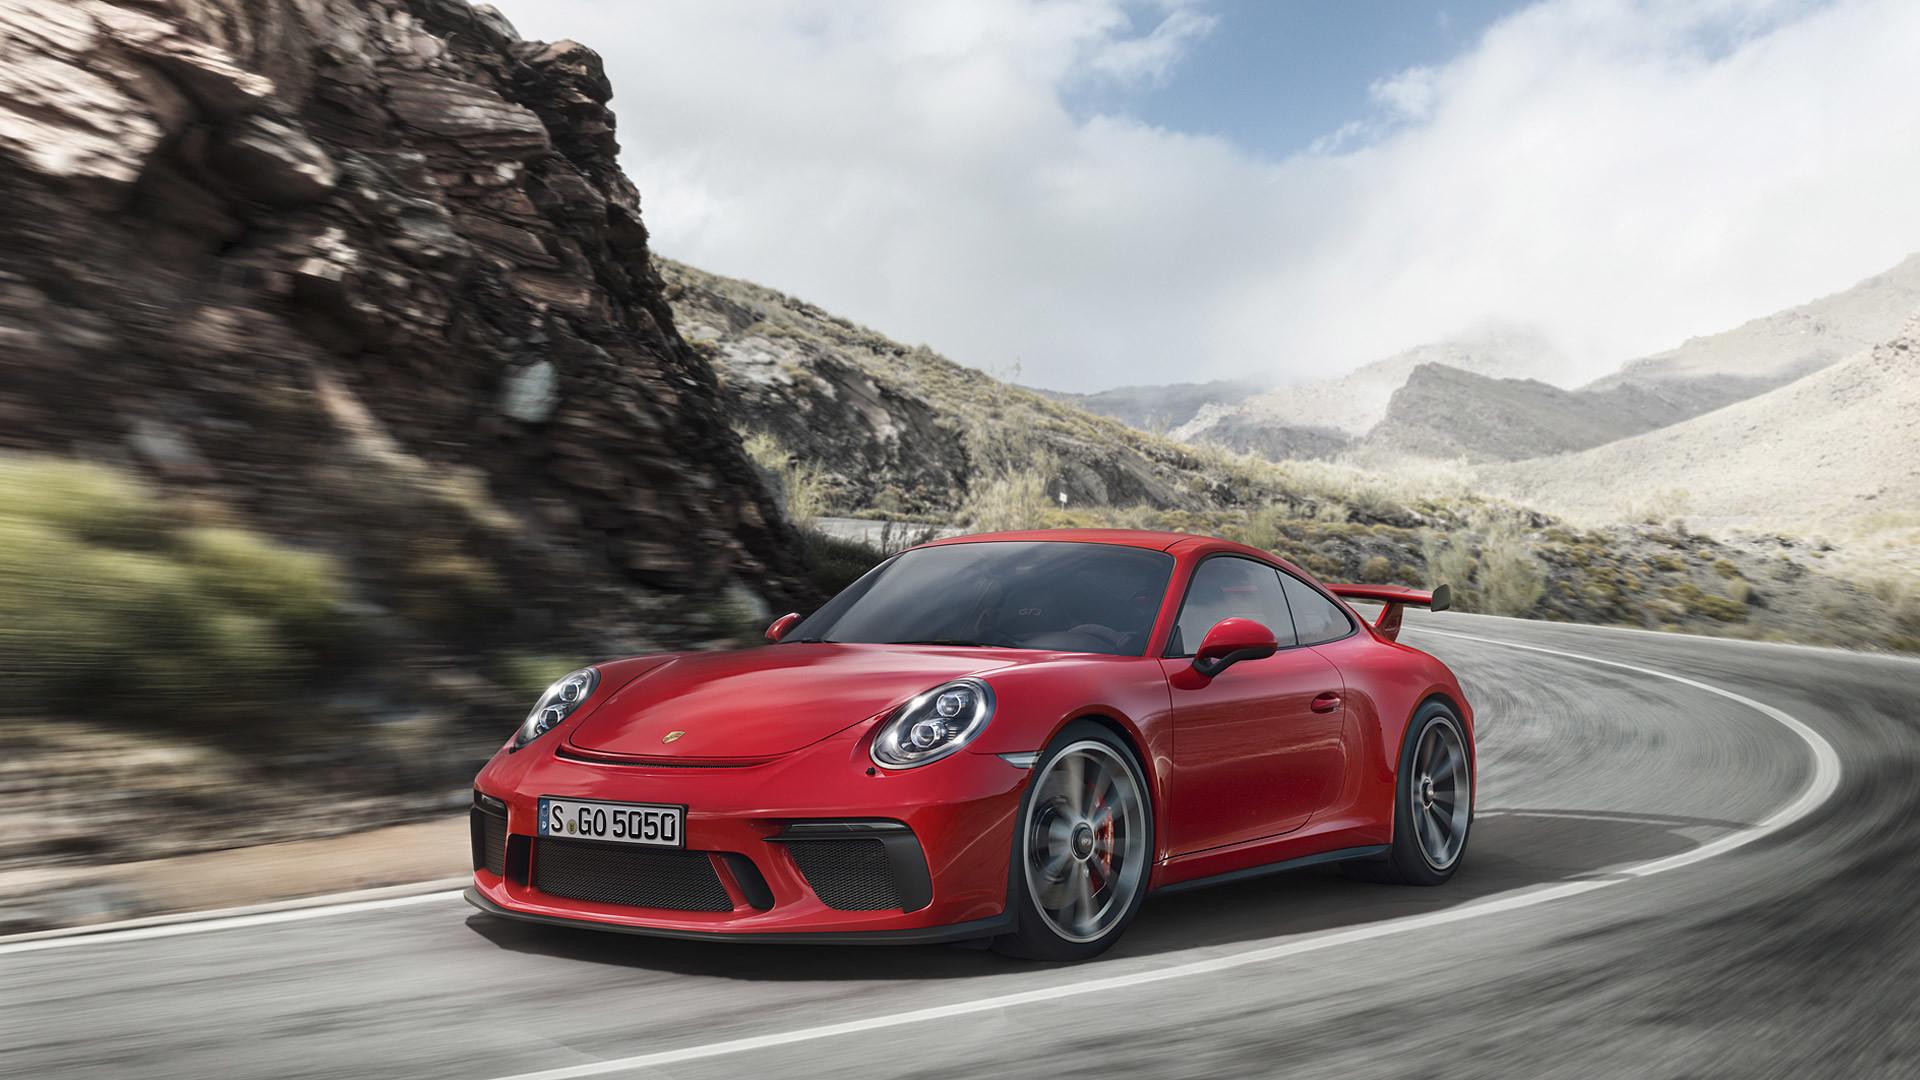 Porsche Gt3 Wallpaper 69 Pictures